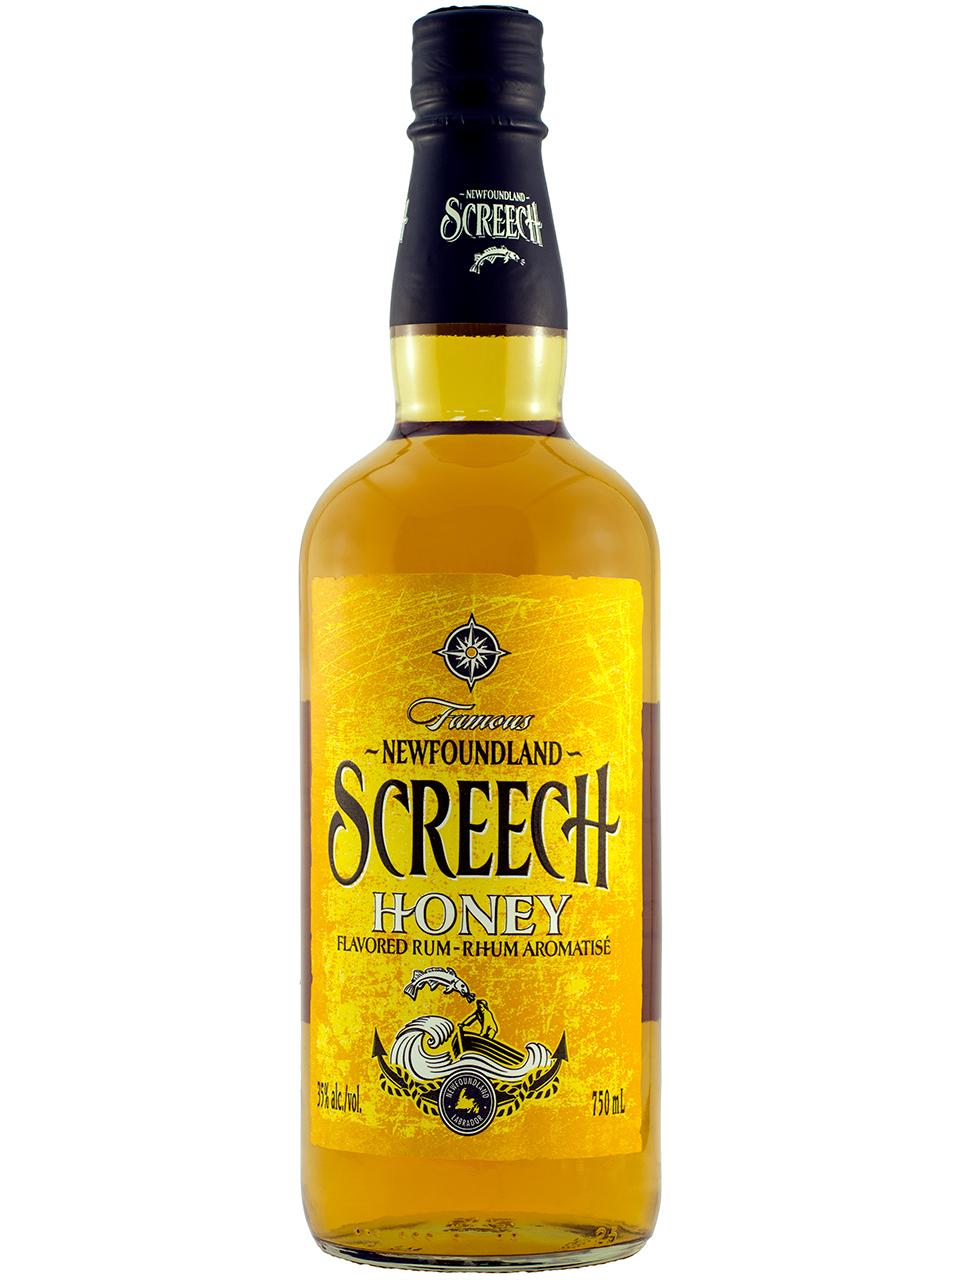 Screech Honey